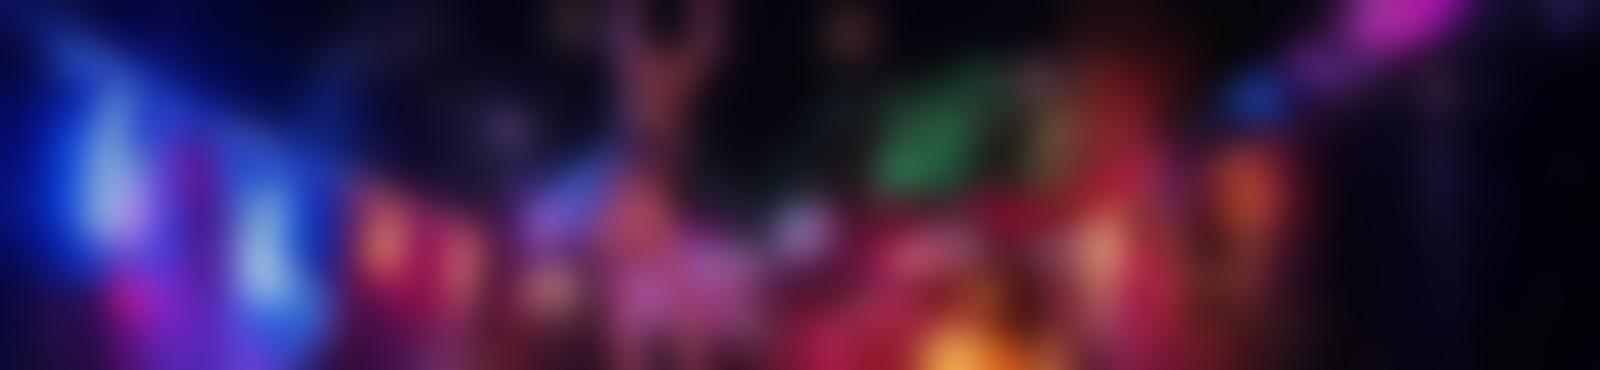 Blurred 1e646053 53e3 4c8d 95cf d8cfe6e12e01